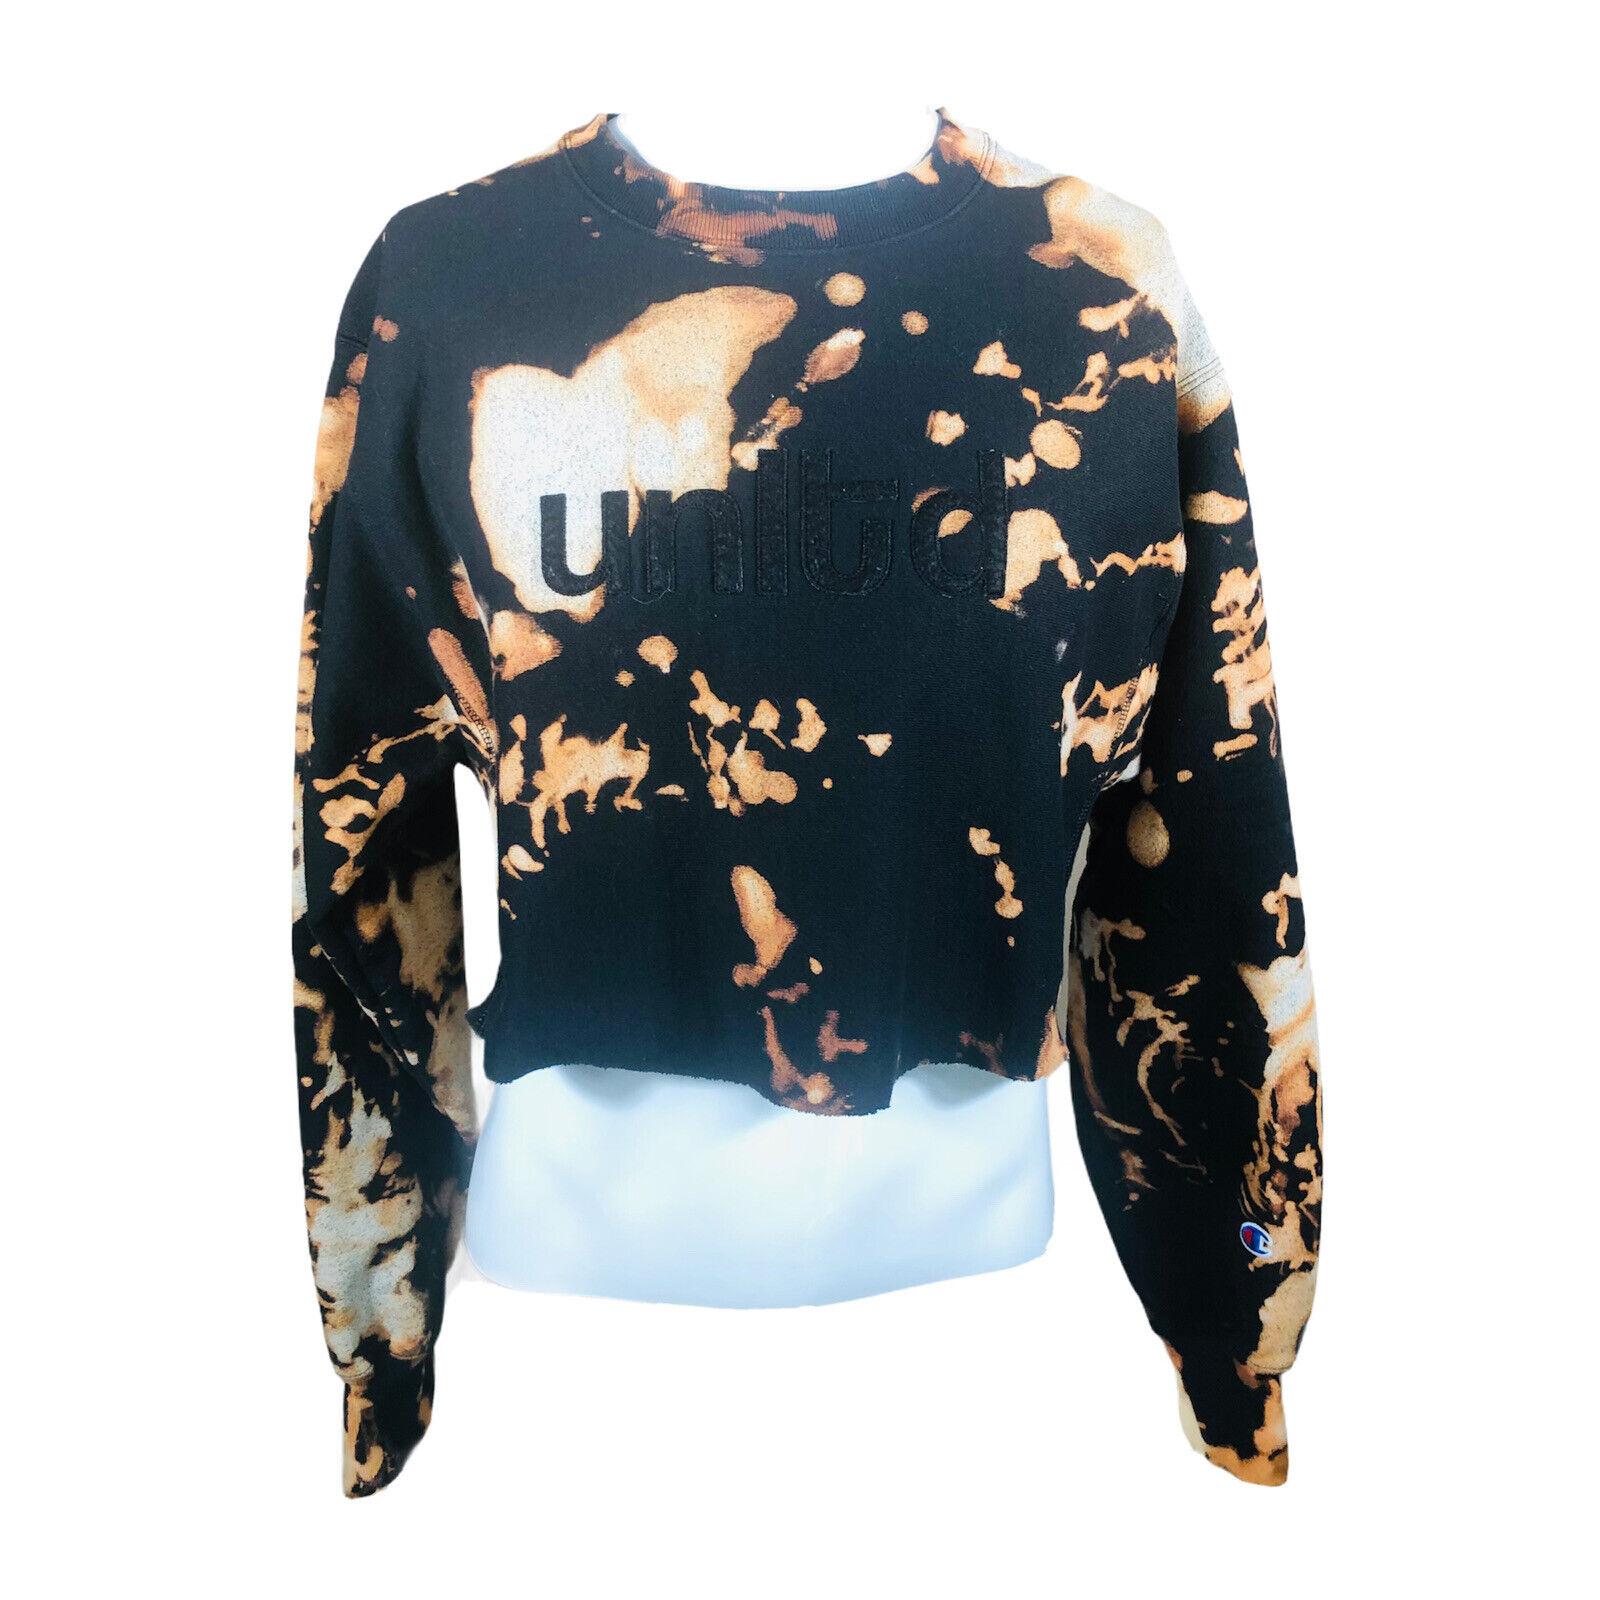 VTG Champion Reverse Weave Women's Medium DIY Cutoff Croptop Sweatshirt